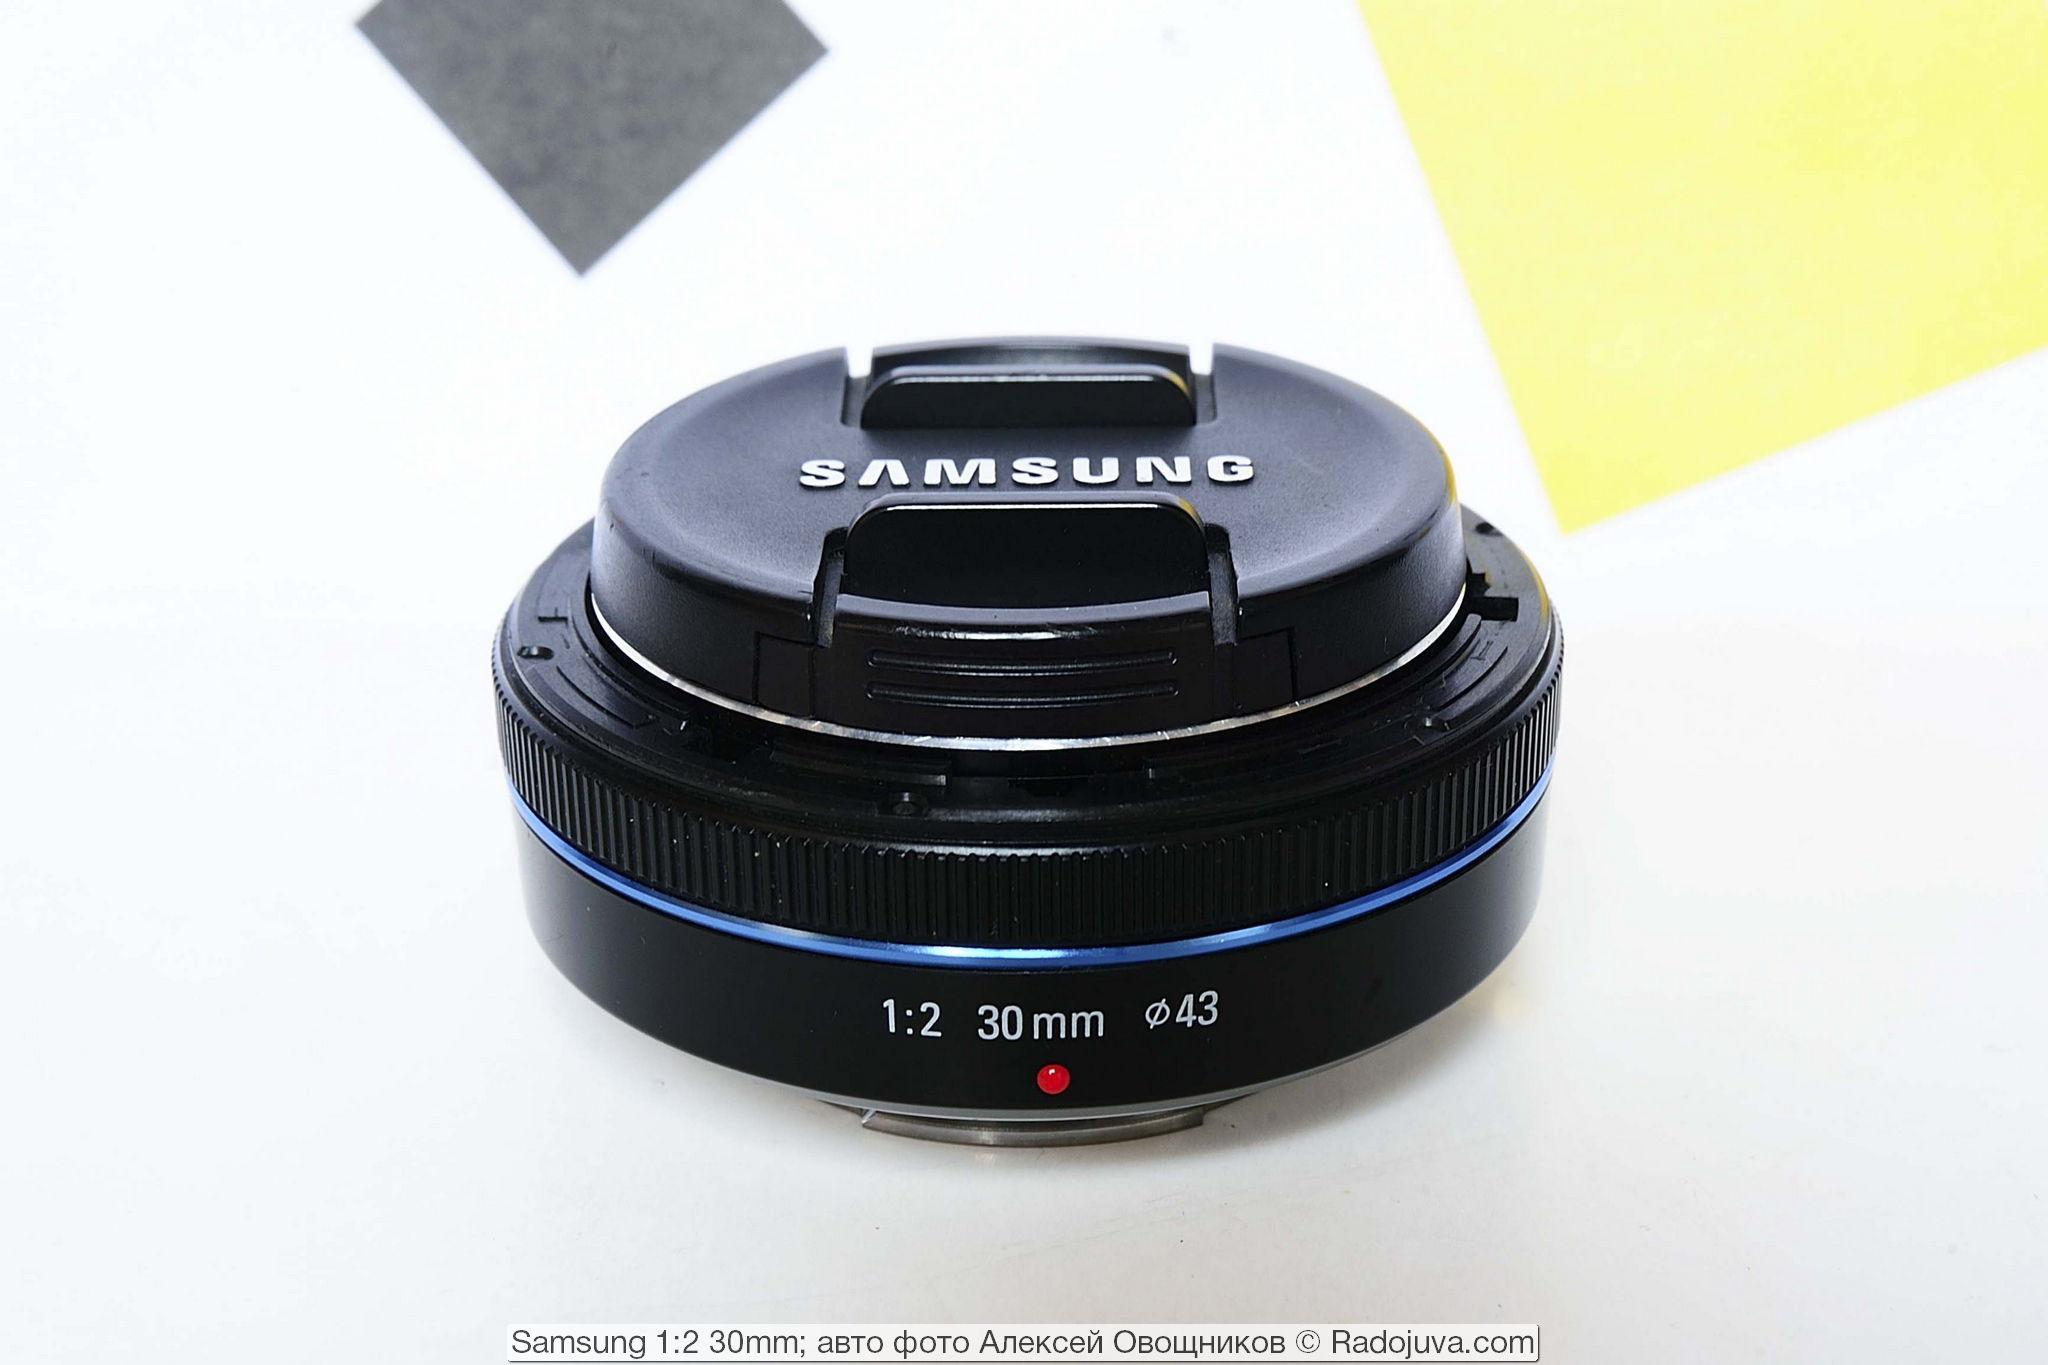 Объектив Samsung NX 30 mm F1:2 и немного о системе Samsung NX.